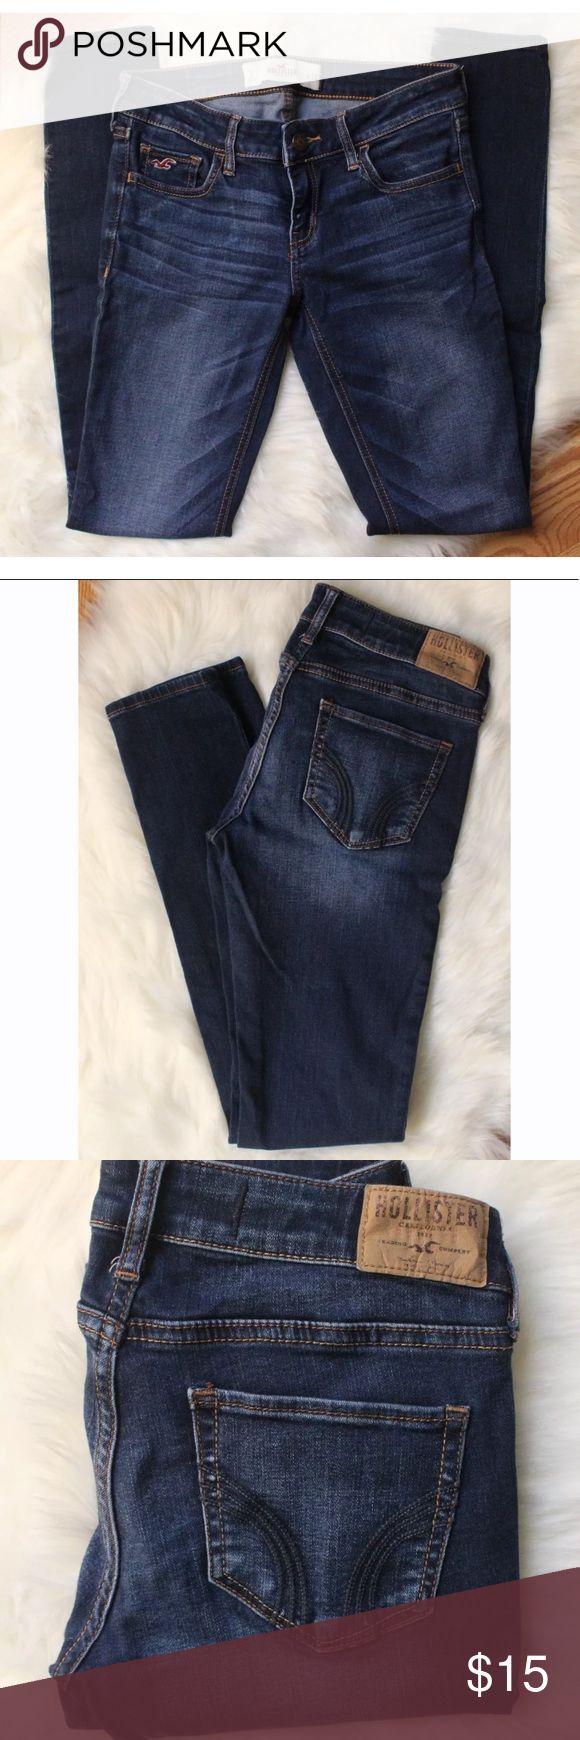 "Hollister straight Leg | Dark wash jeans Womens Hollister Straight Leg Dark Wash Jeans. Excellent condition! Size:3 Waist: 13"" Inseam: 30"" Hollister Jeans Straight Leg"